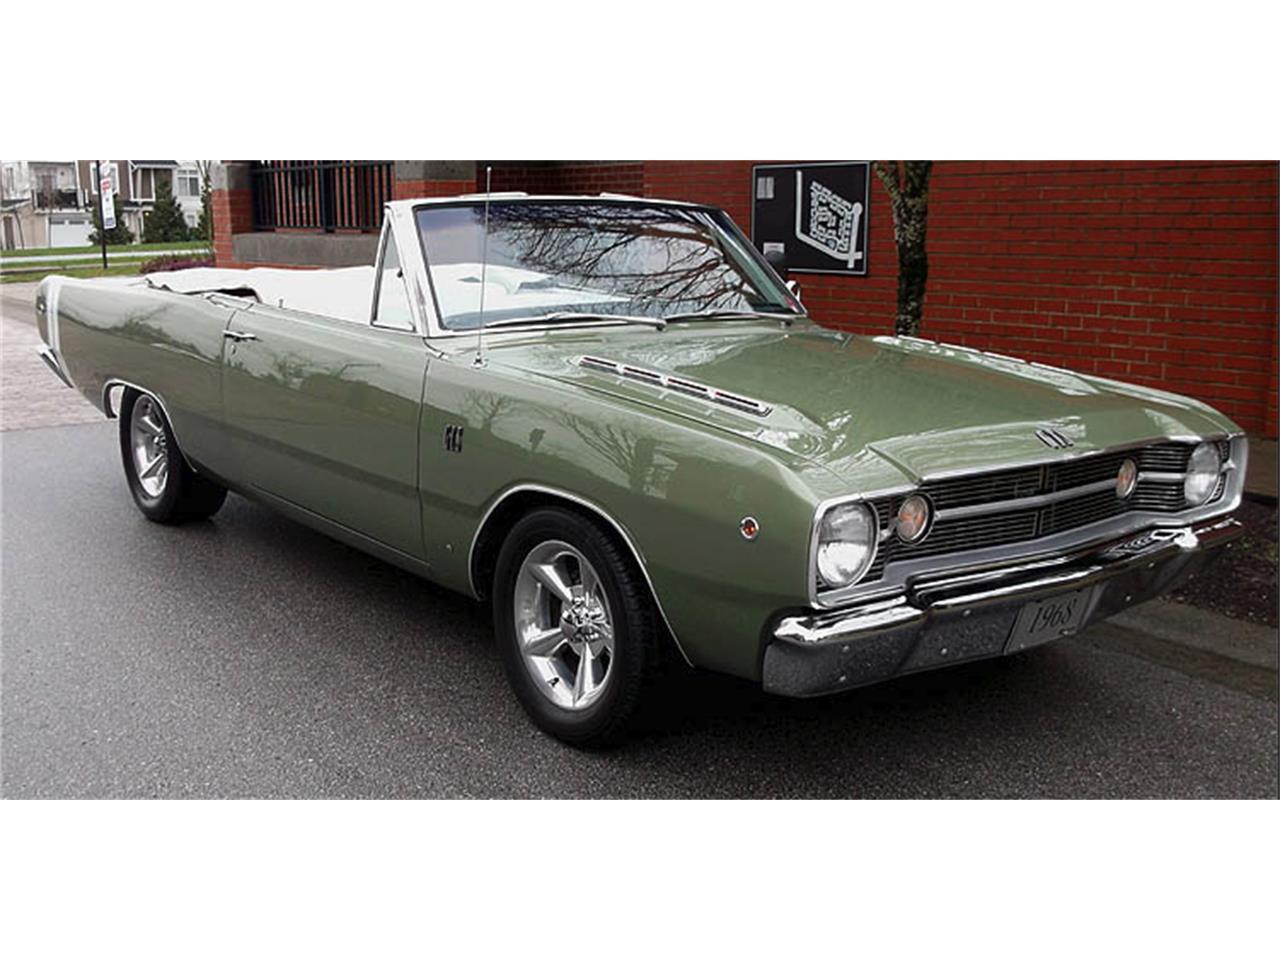 1968 Dodge Dart Gts For Sale Classiccars Com Cc 1065031